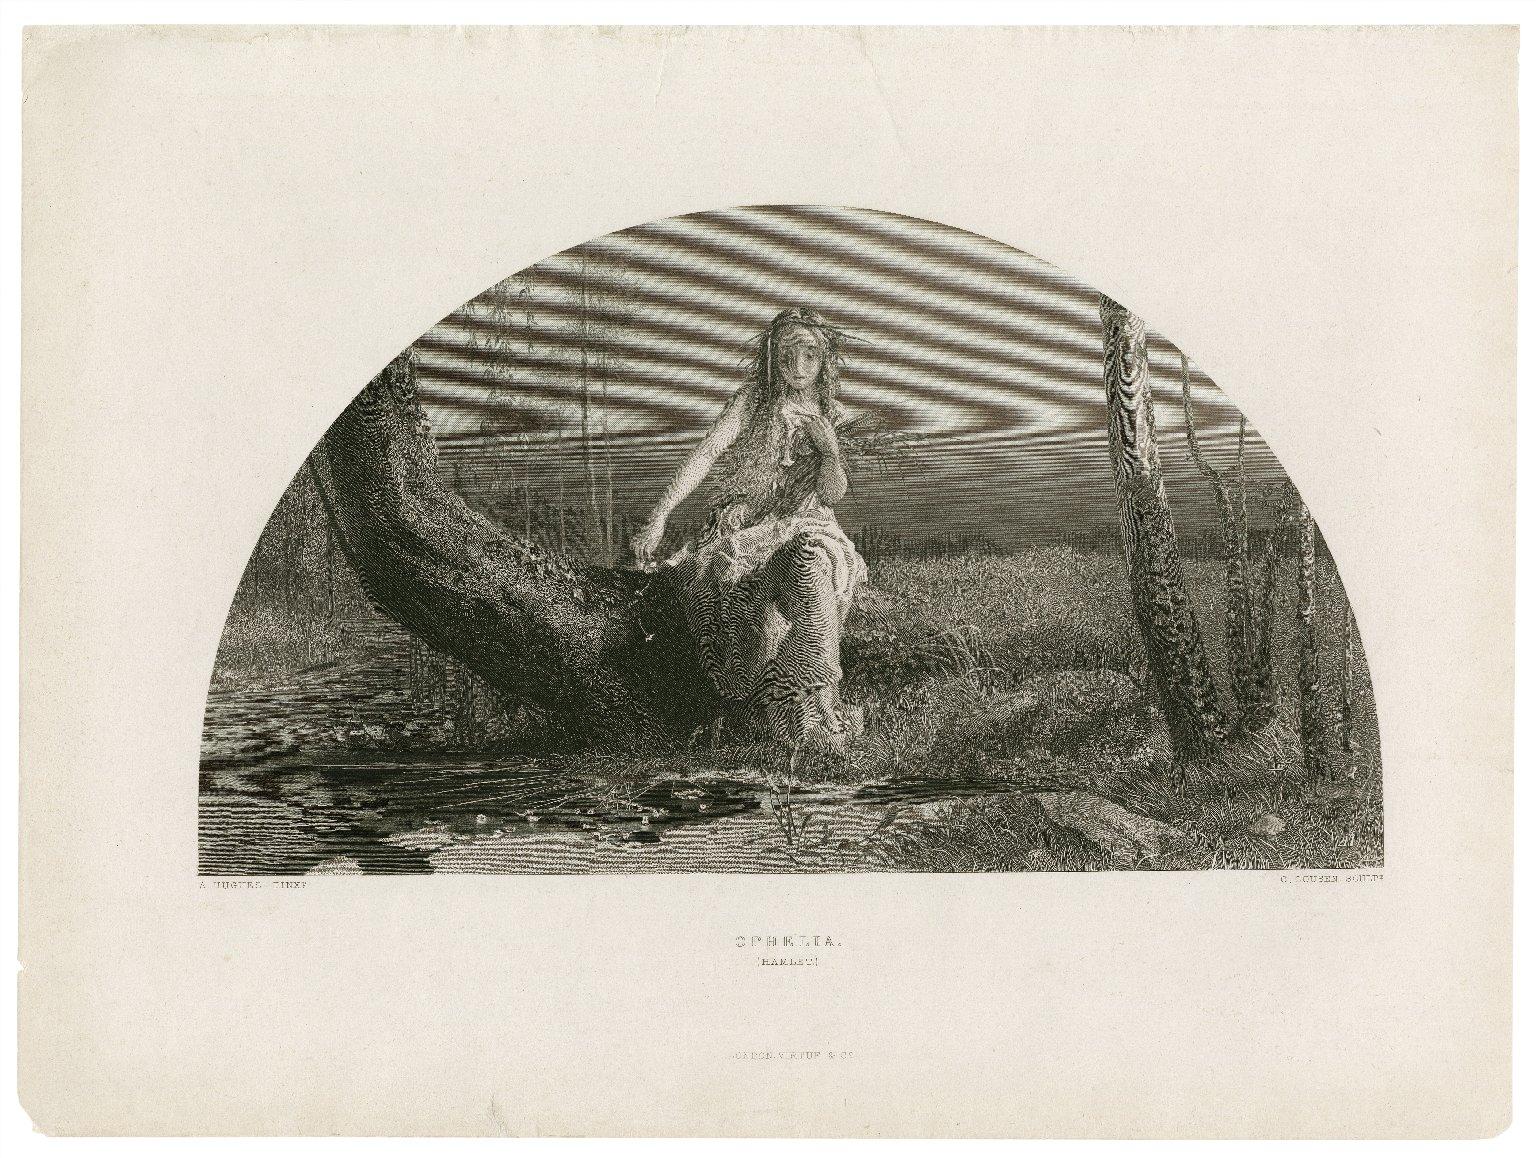 Ophelia [character in] Hamlet [graphic] / A. Hughes pinxt. ; C. Cousen sculpt.